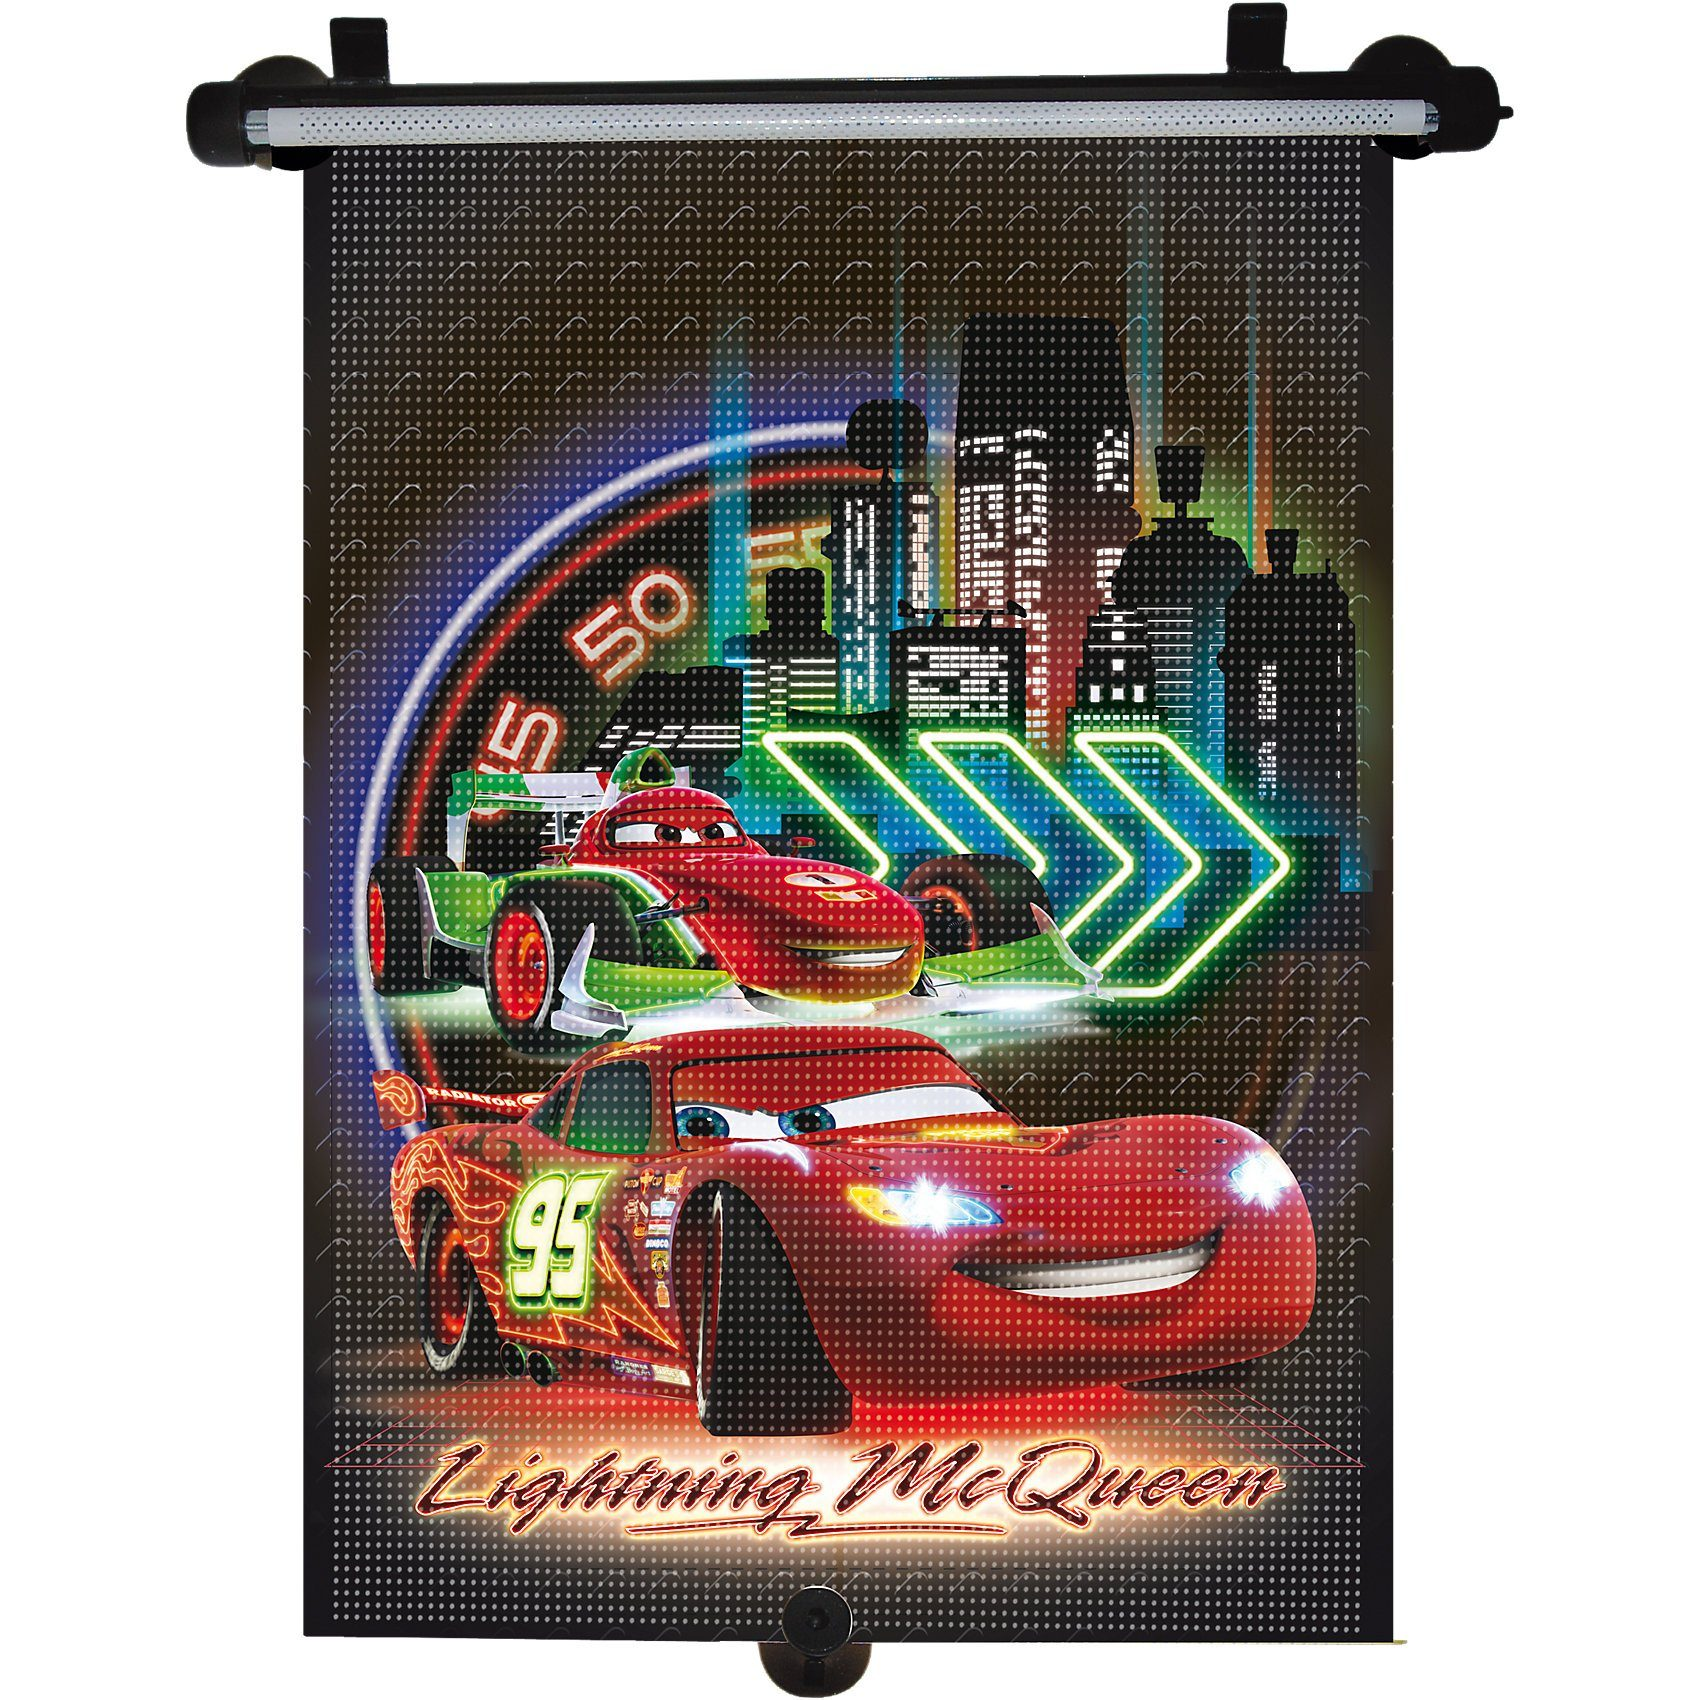 Kaufmann Sonnenrollo, Cars Neon